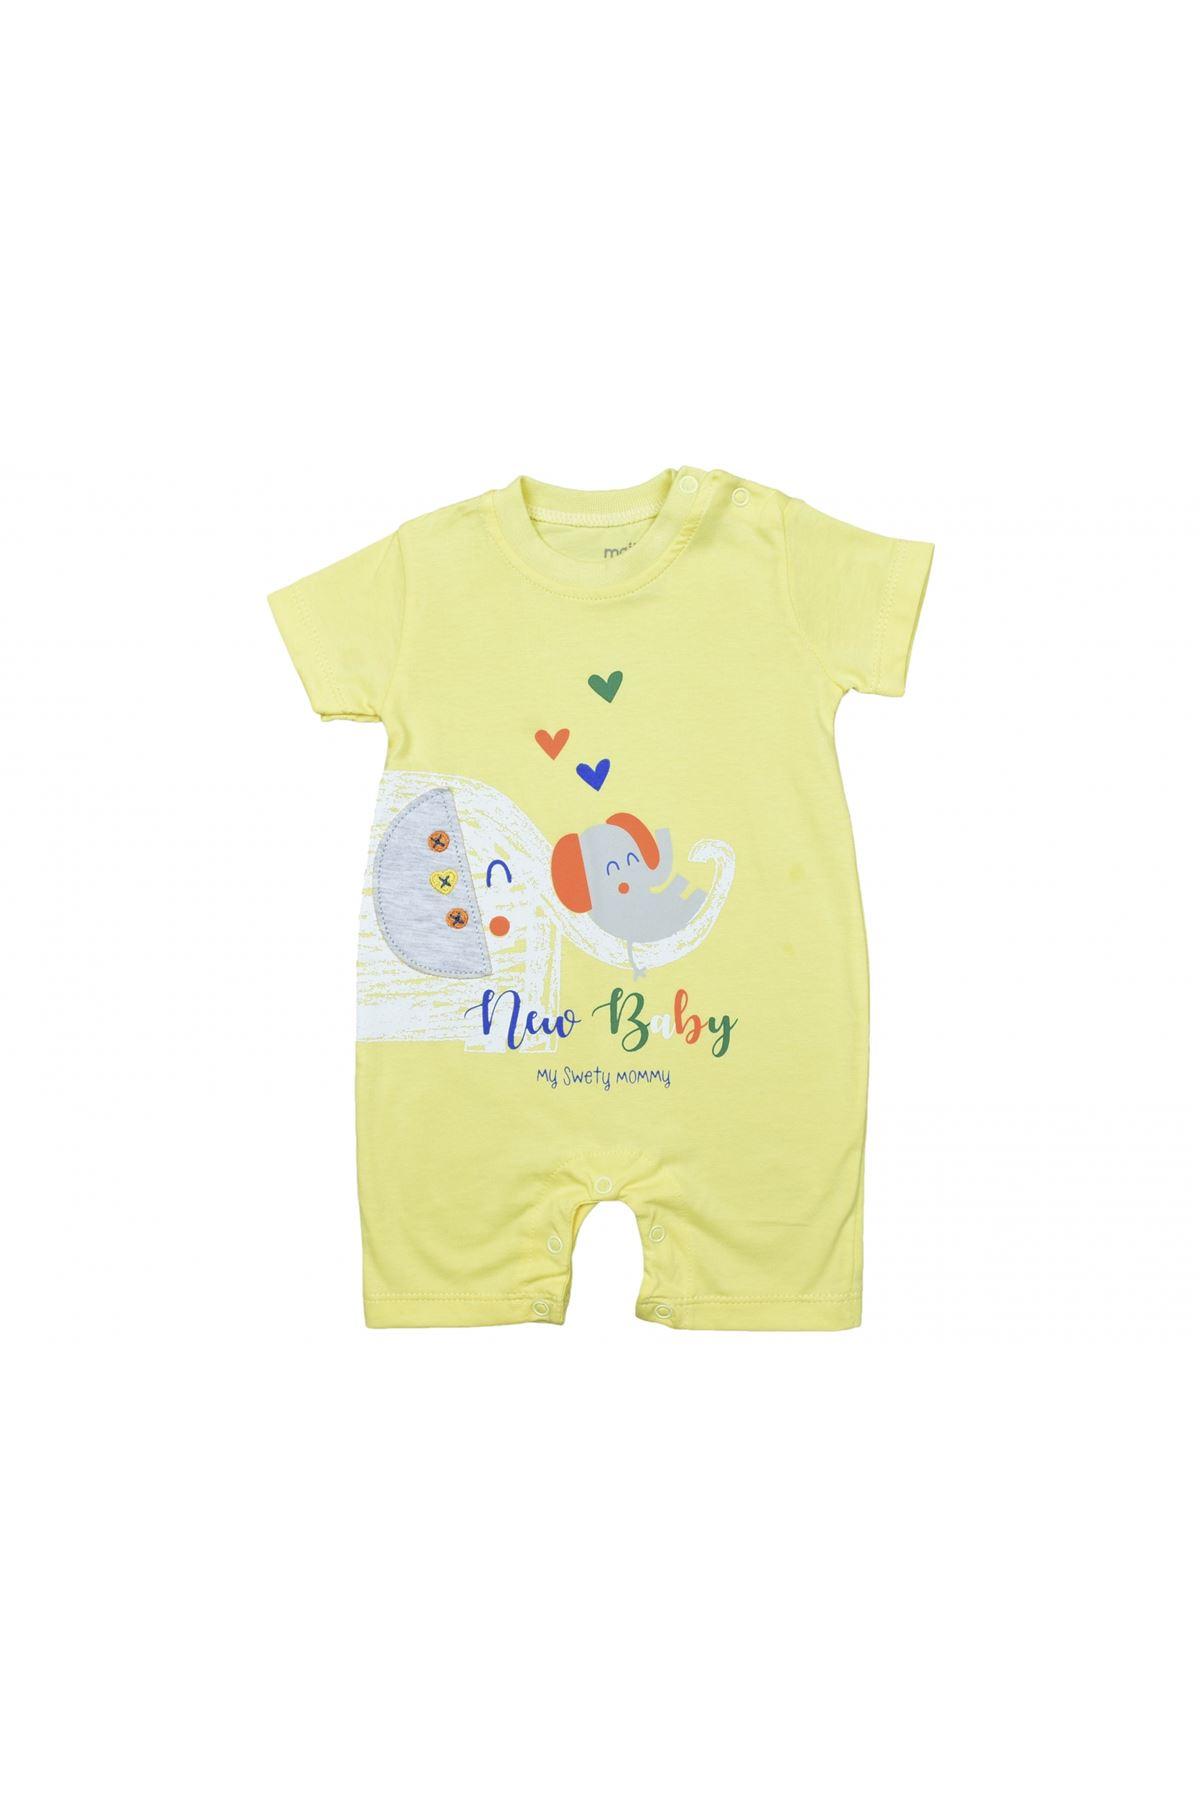 Maibella, New Baby Fil Desenli, Kısa Tulum, Sarı, MAİ14-2004